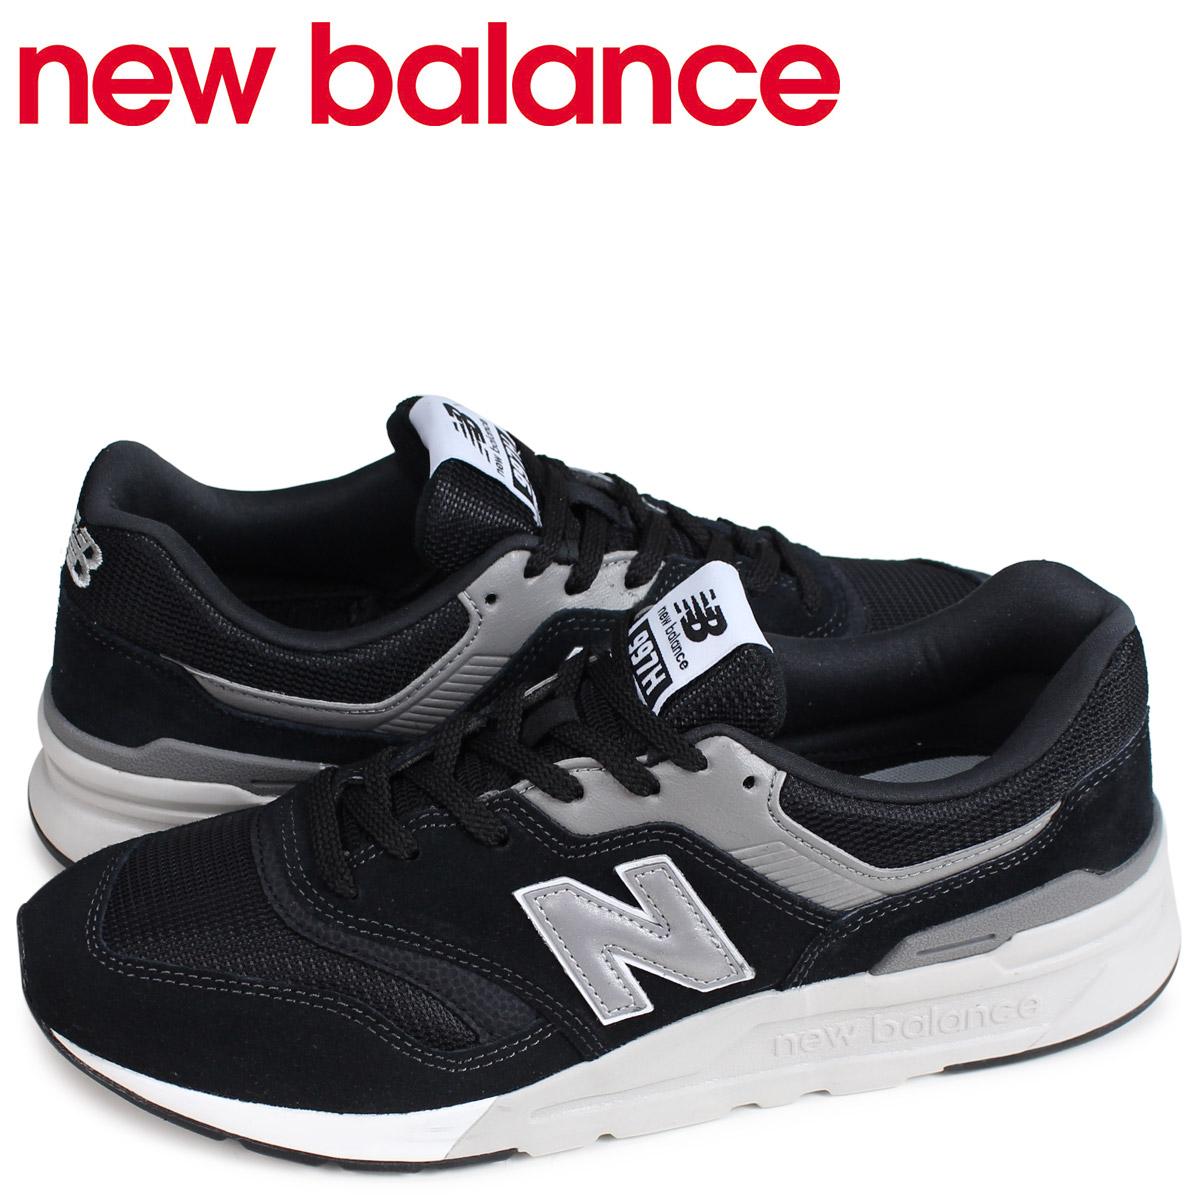 new balance 21